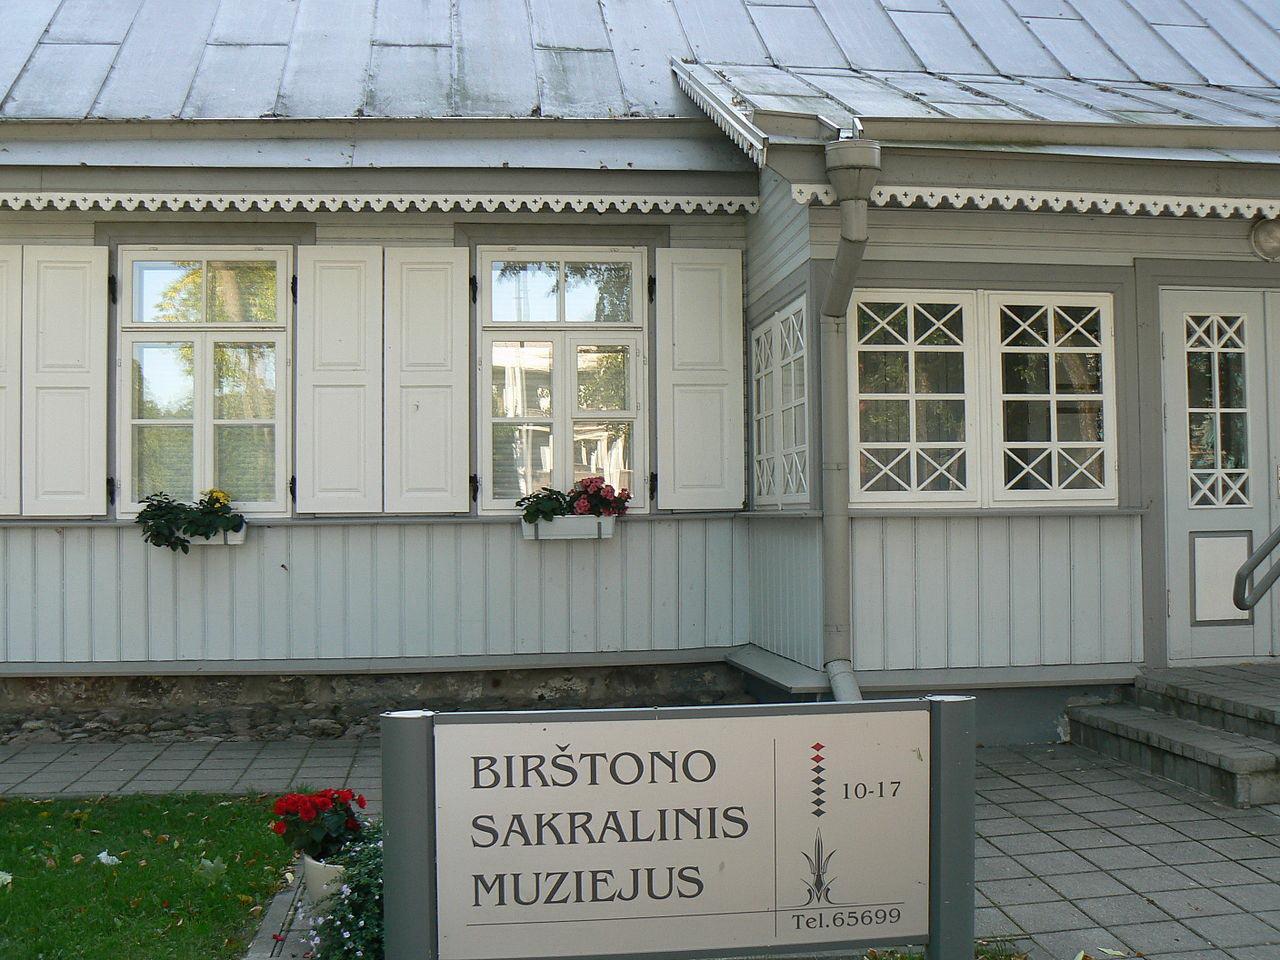 The Birštonas Museum of Sacral Art in Lithuania